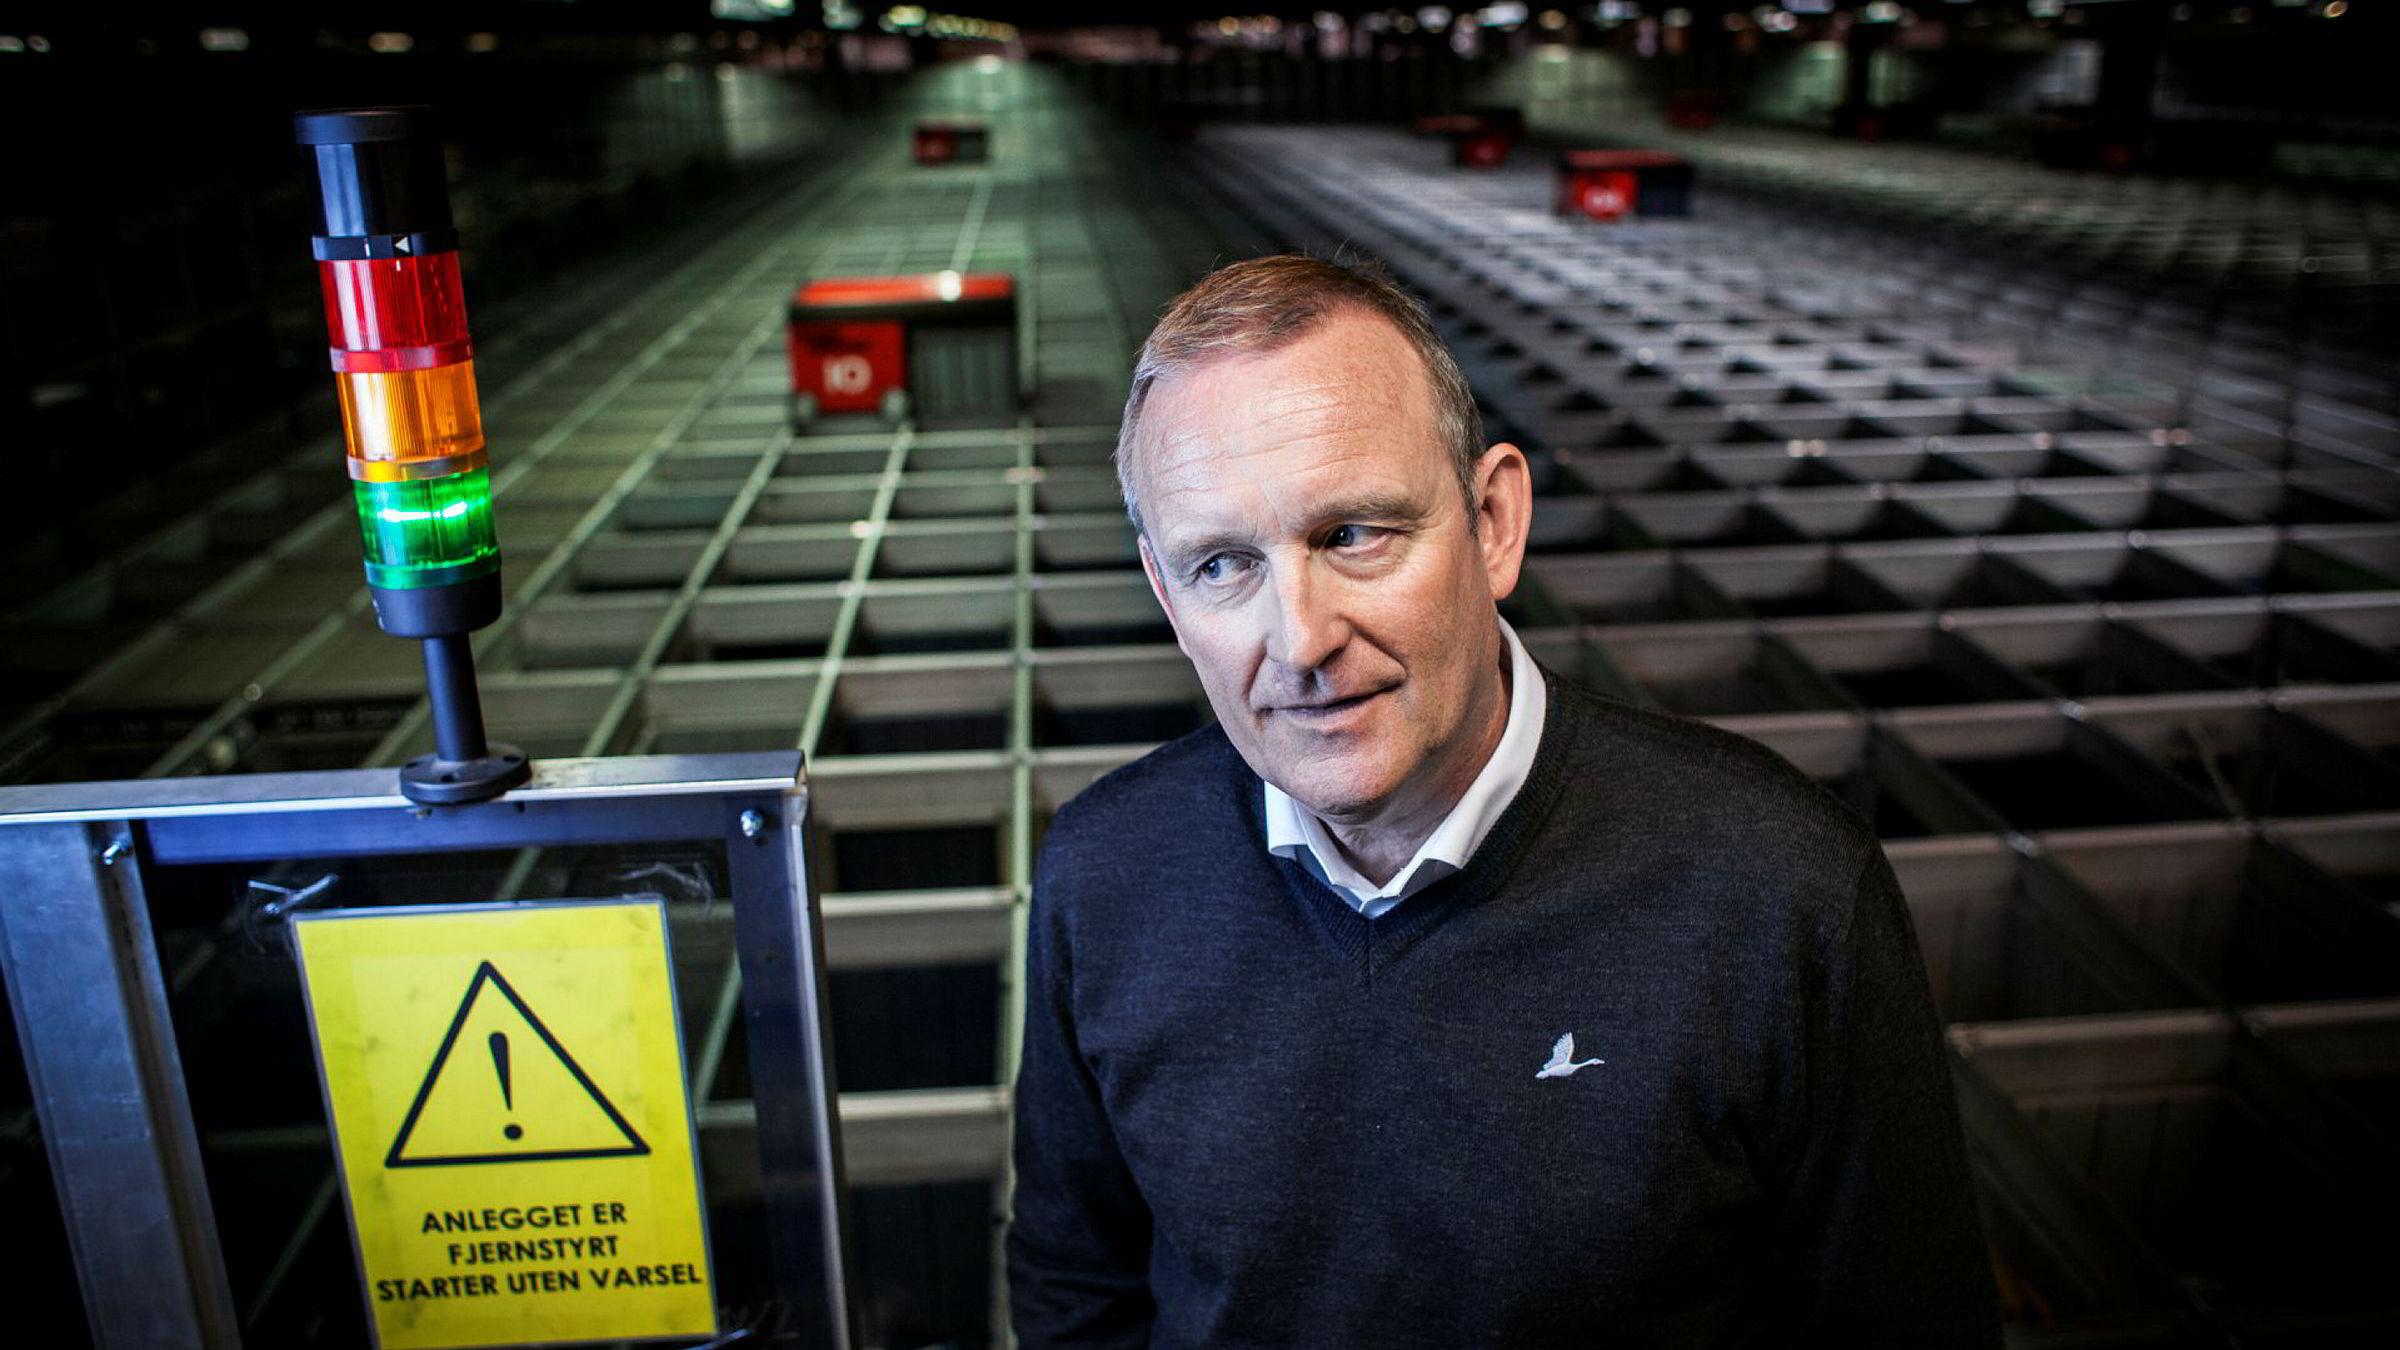 I roboten til konsernsjef Ole Vinje skal det ryddes plass til varer fra andre leverandører som presenteres i den nye markedsplassen. Foto: Klaudia Lech